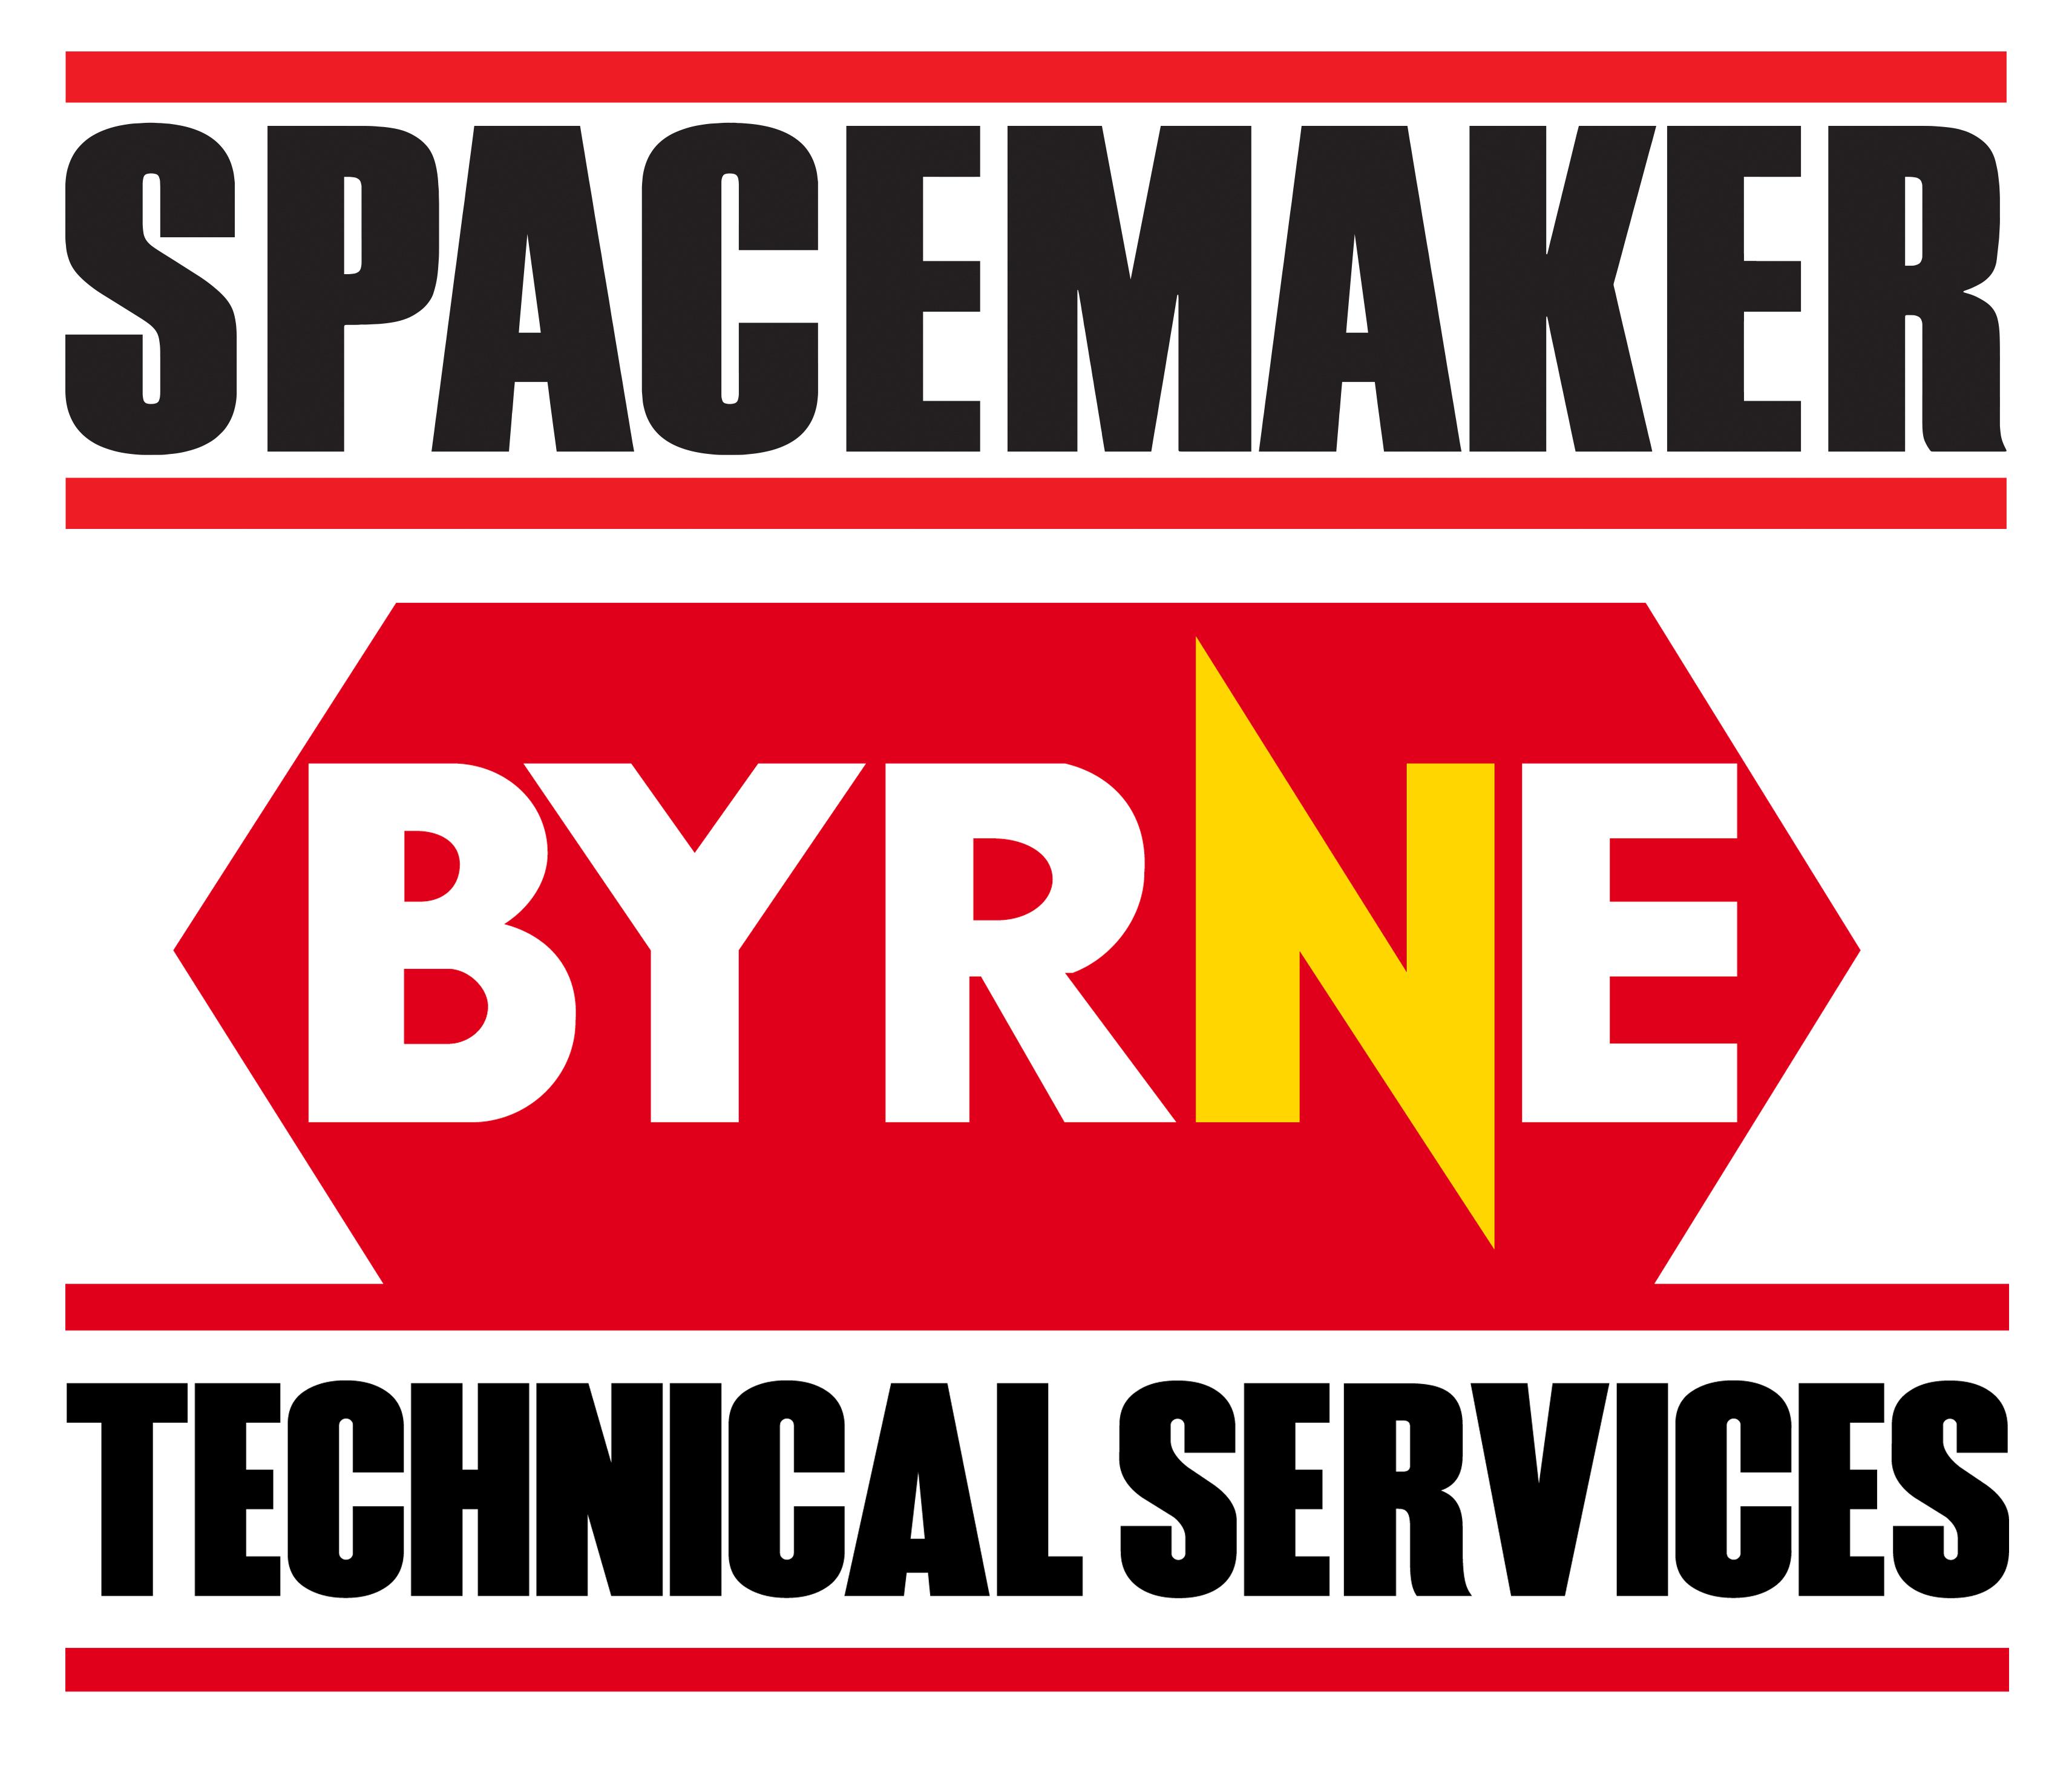 Spacemaker